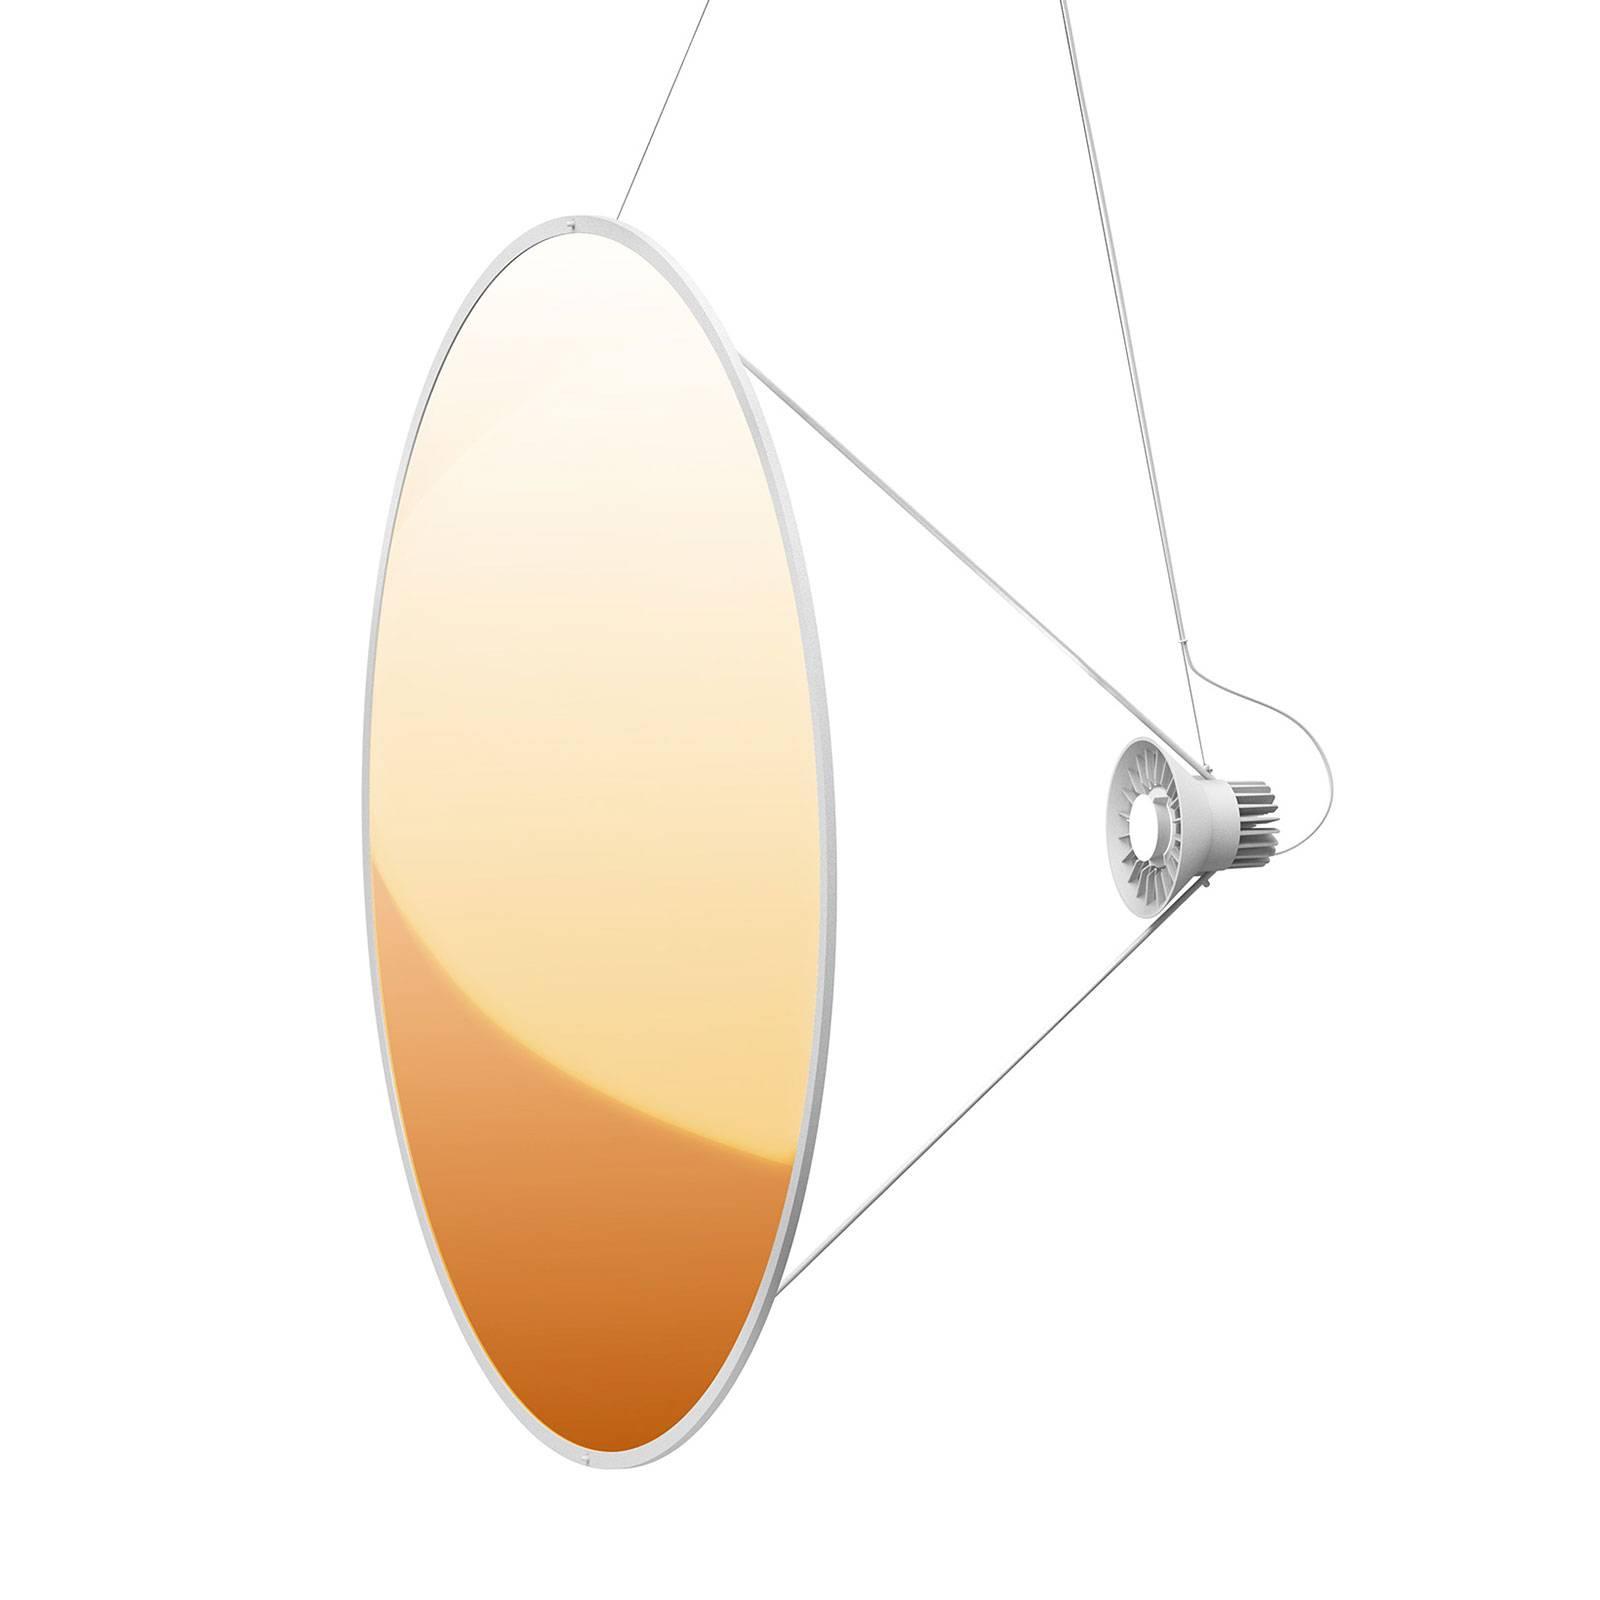 Luceplan Amisol -LED-riippuvalaisin Ø 110 cm kulta